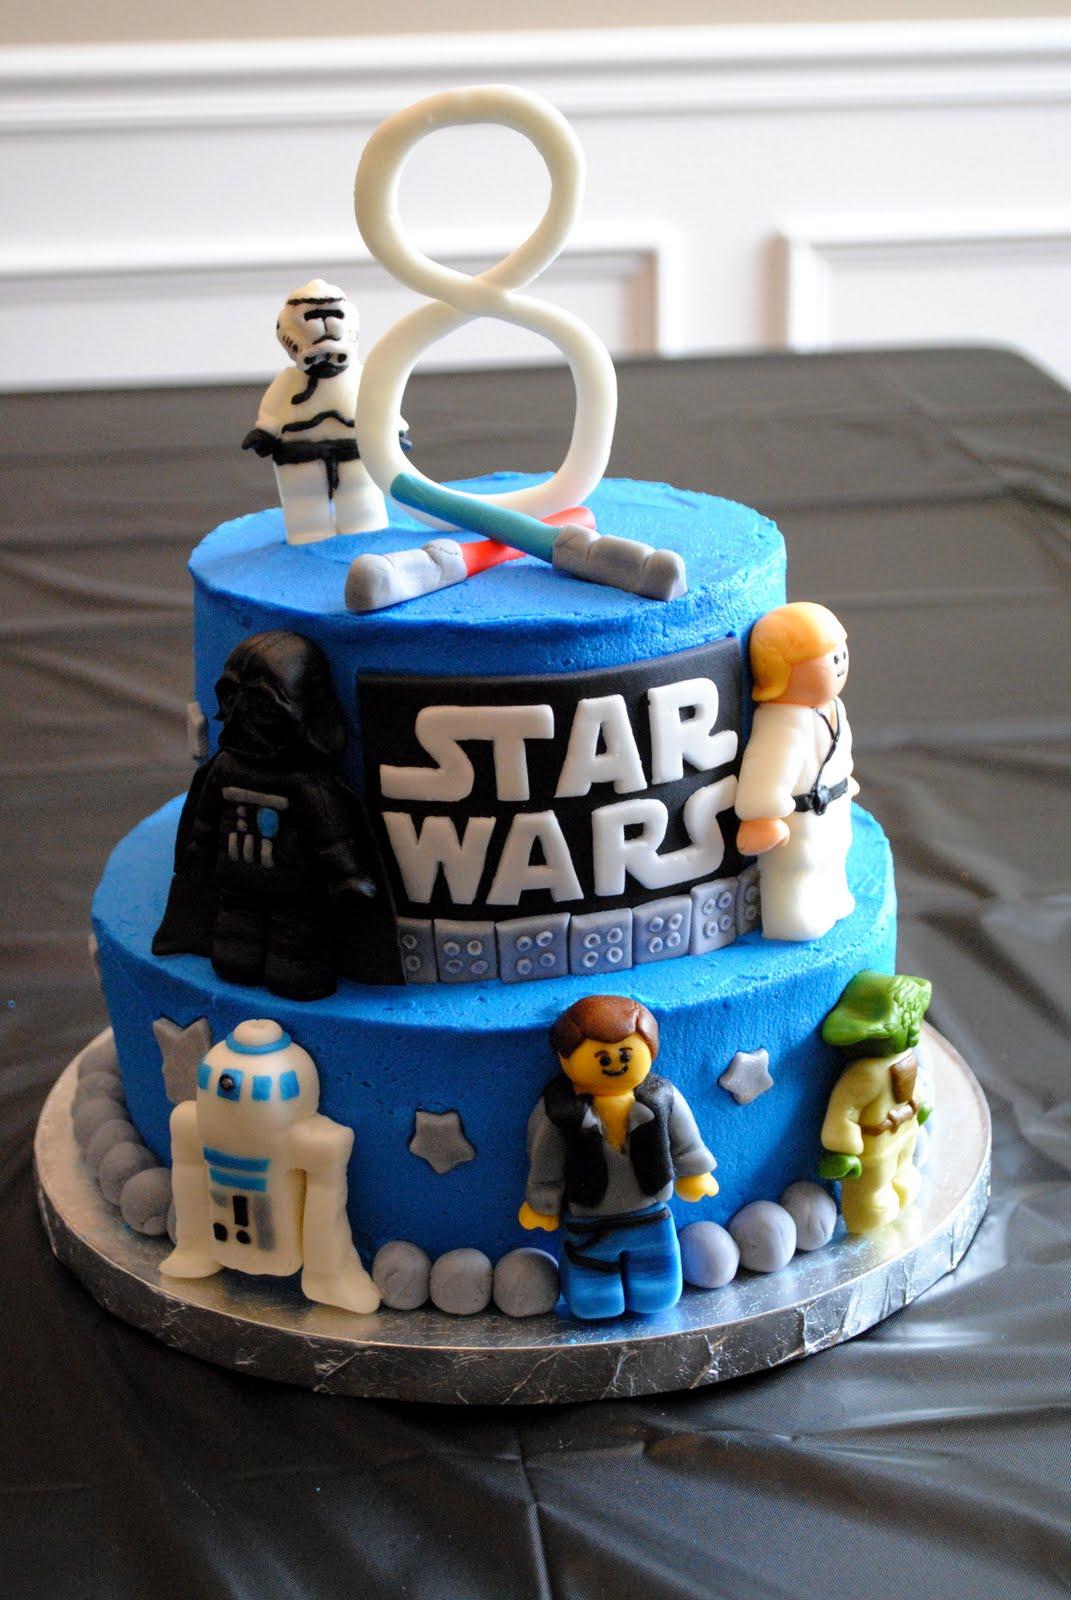 Miraculous 11 Star Wars Lego Cake Cupcakes Photo Star Wars Birthday Cake Funny Birthday Cards Online Overcheapnameinfo